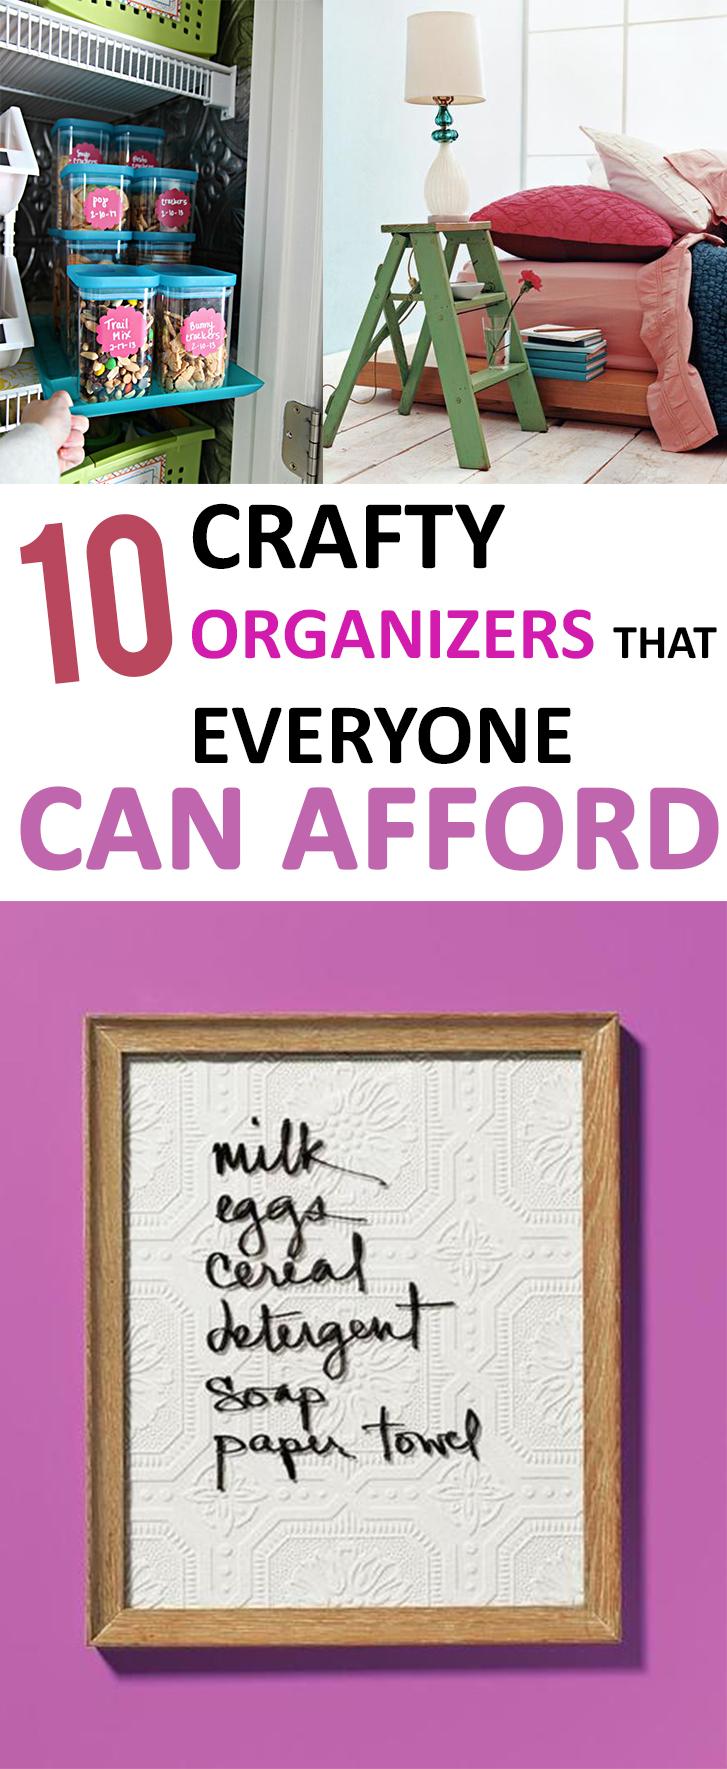 10 Crafty Organizers that Everyone Can Afford